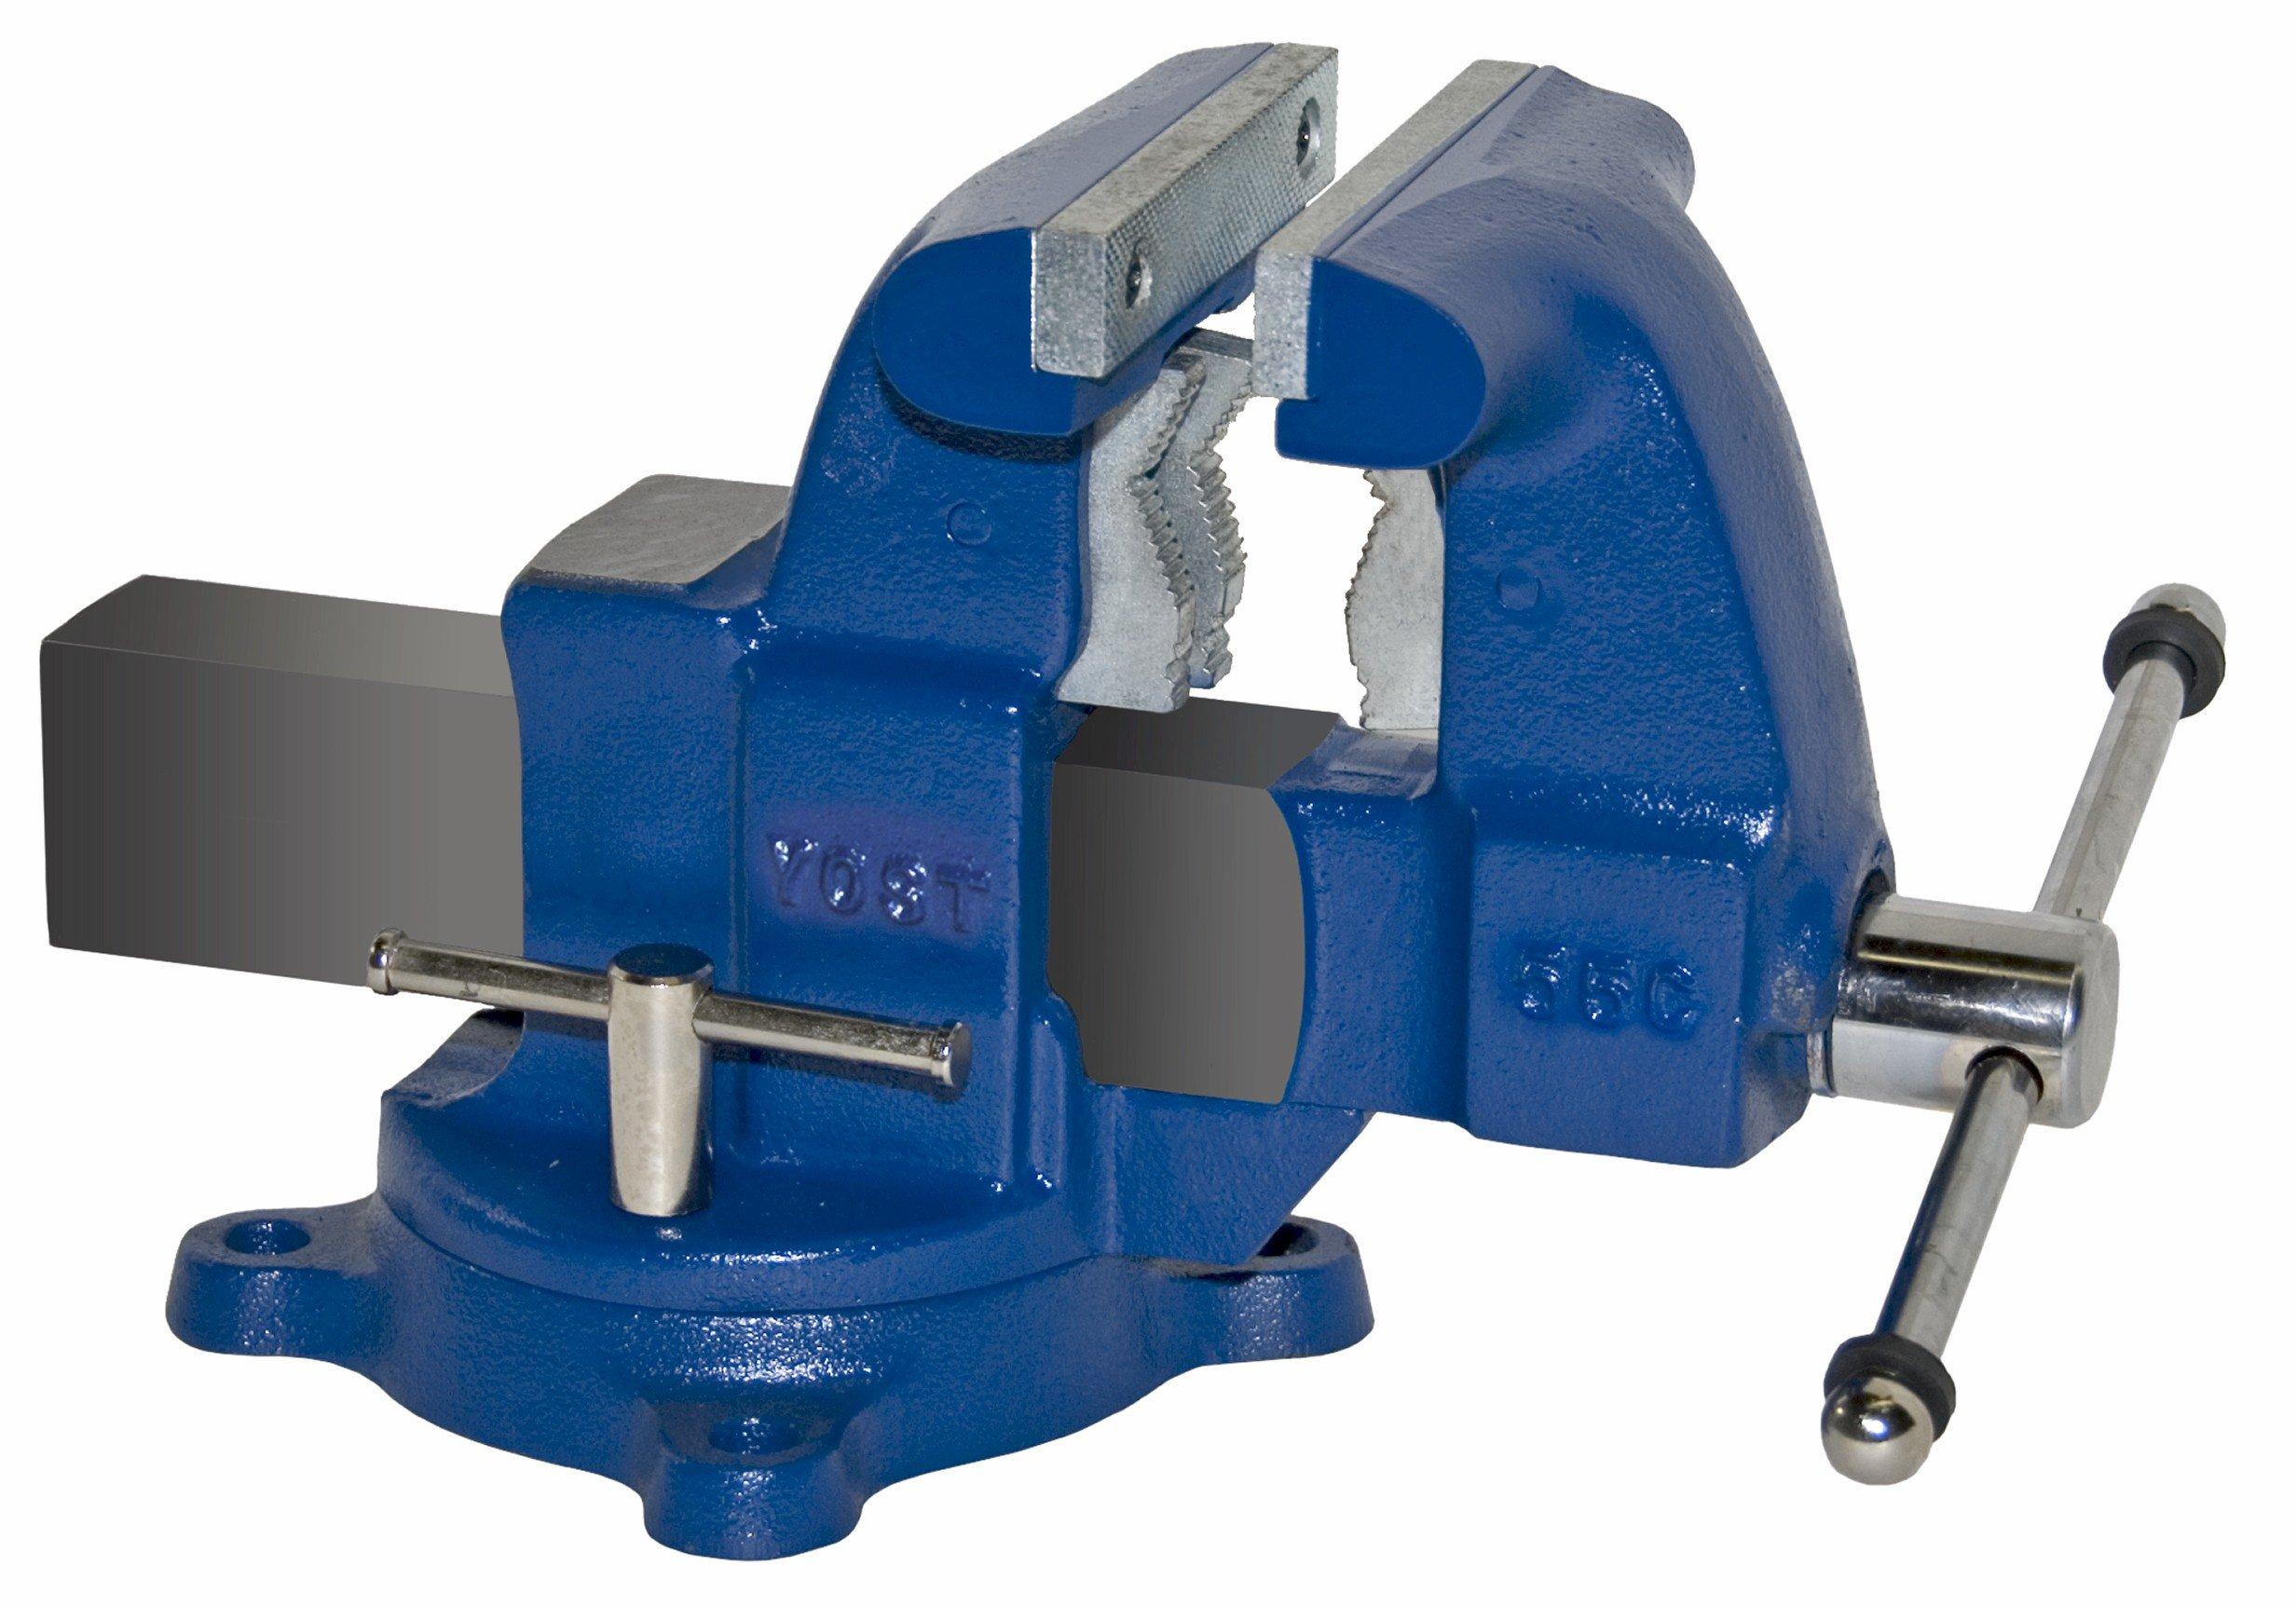 Yost Vises 55C 5.5'' Tradesman Series Industrial Grade Bench Vise by Yost Tools